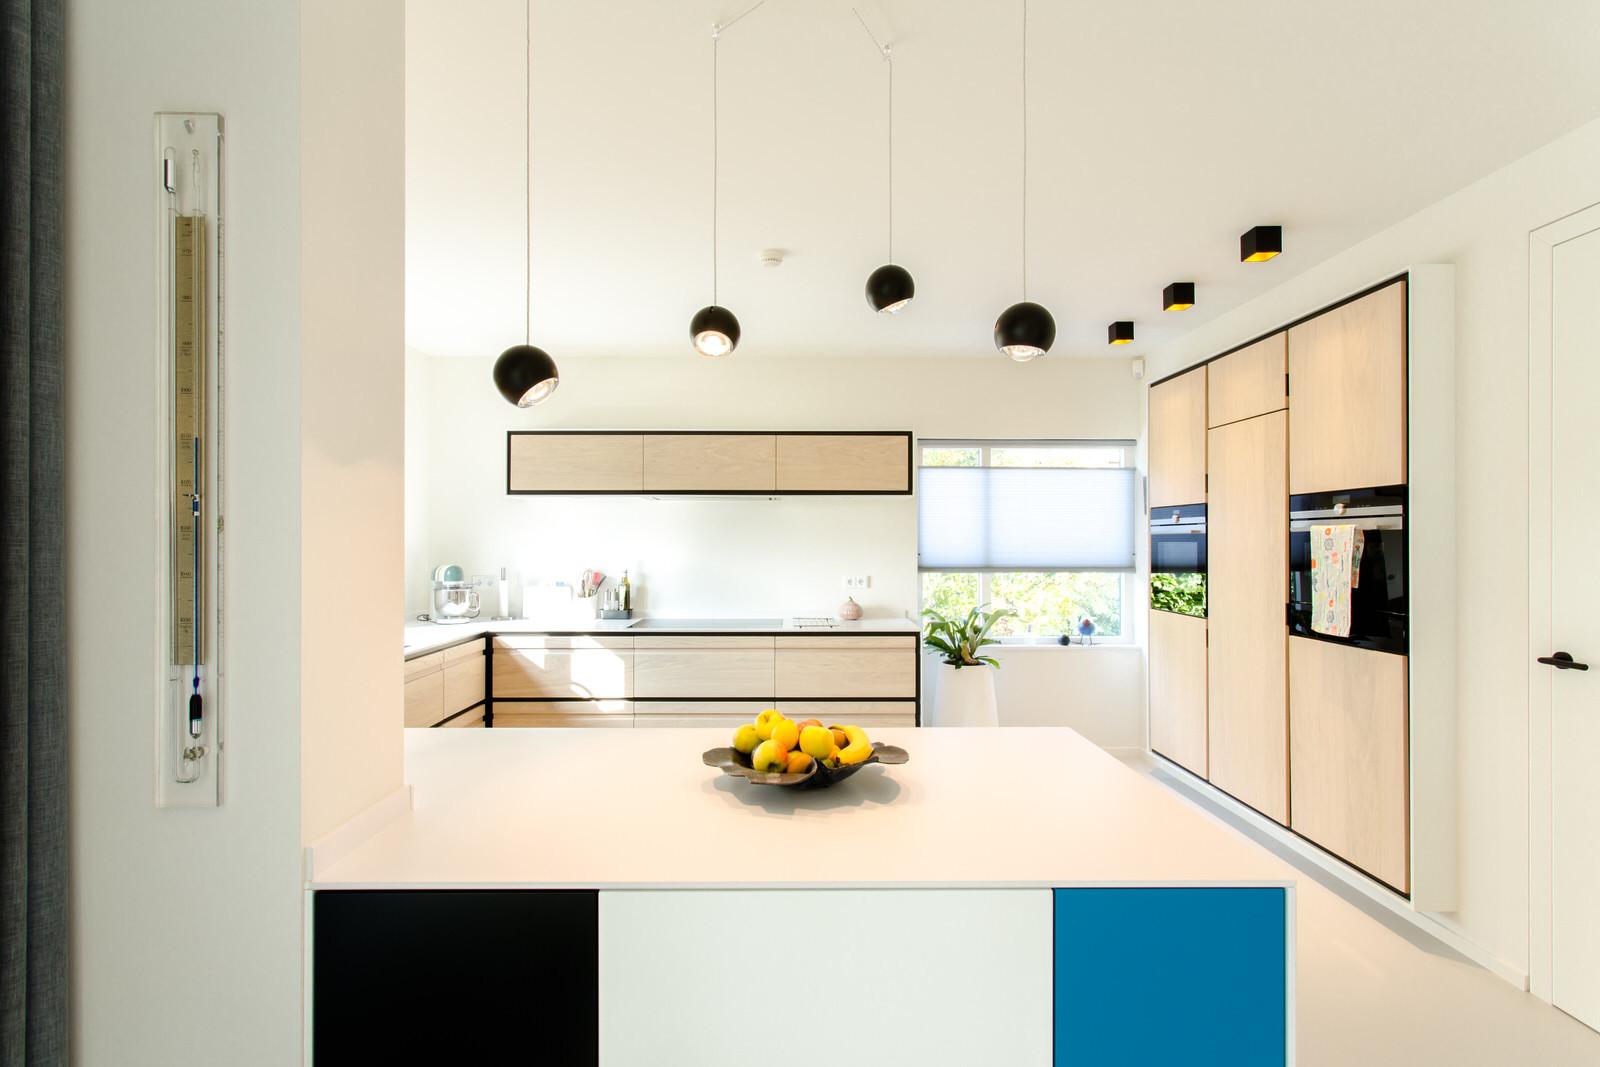 Best Bosch Verlichting Pictures - Moderne huis 2018 - borderdarshan.com